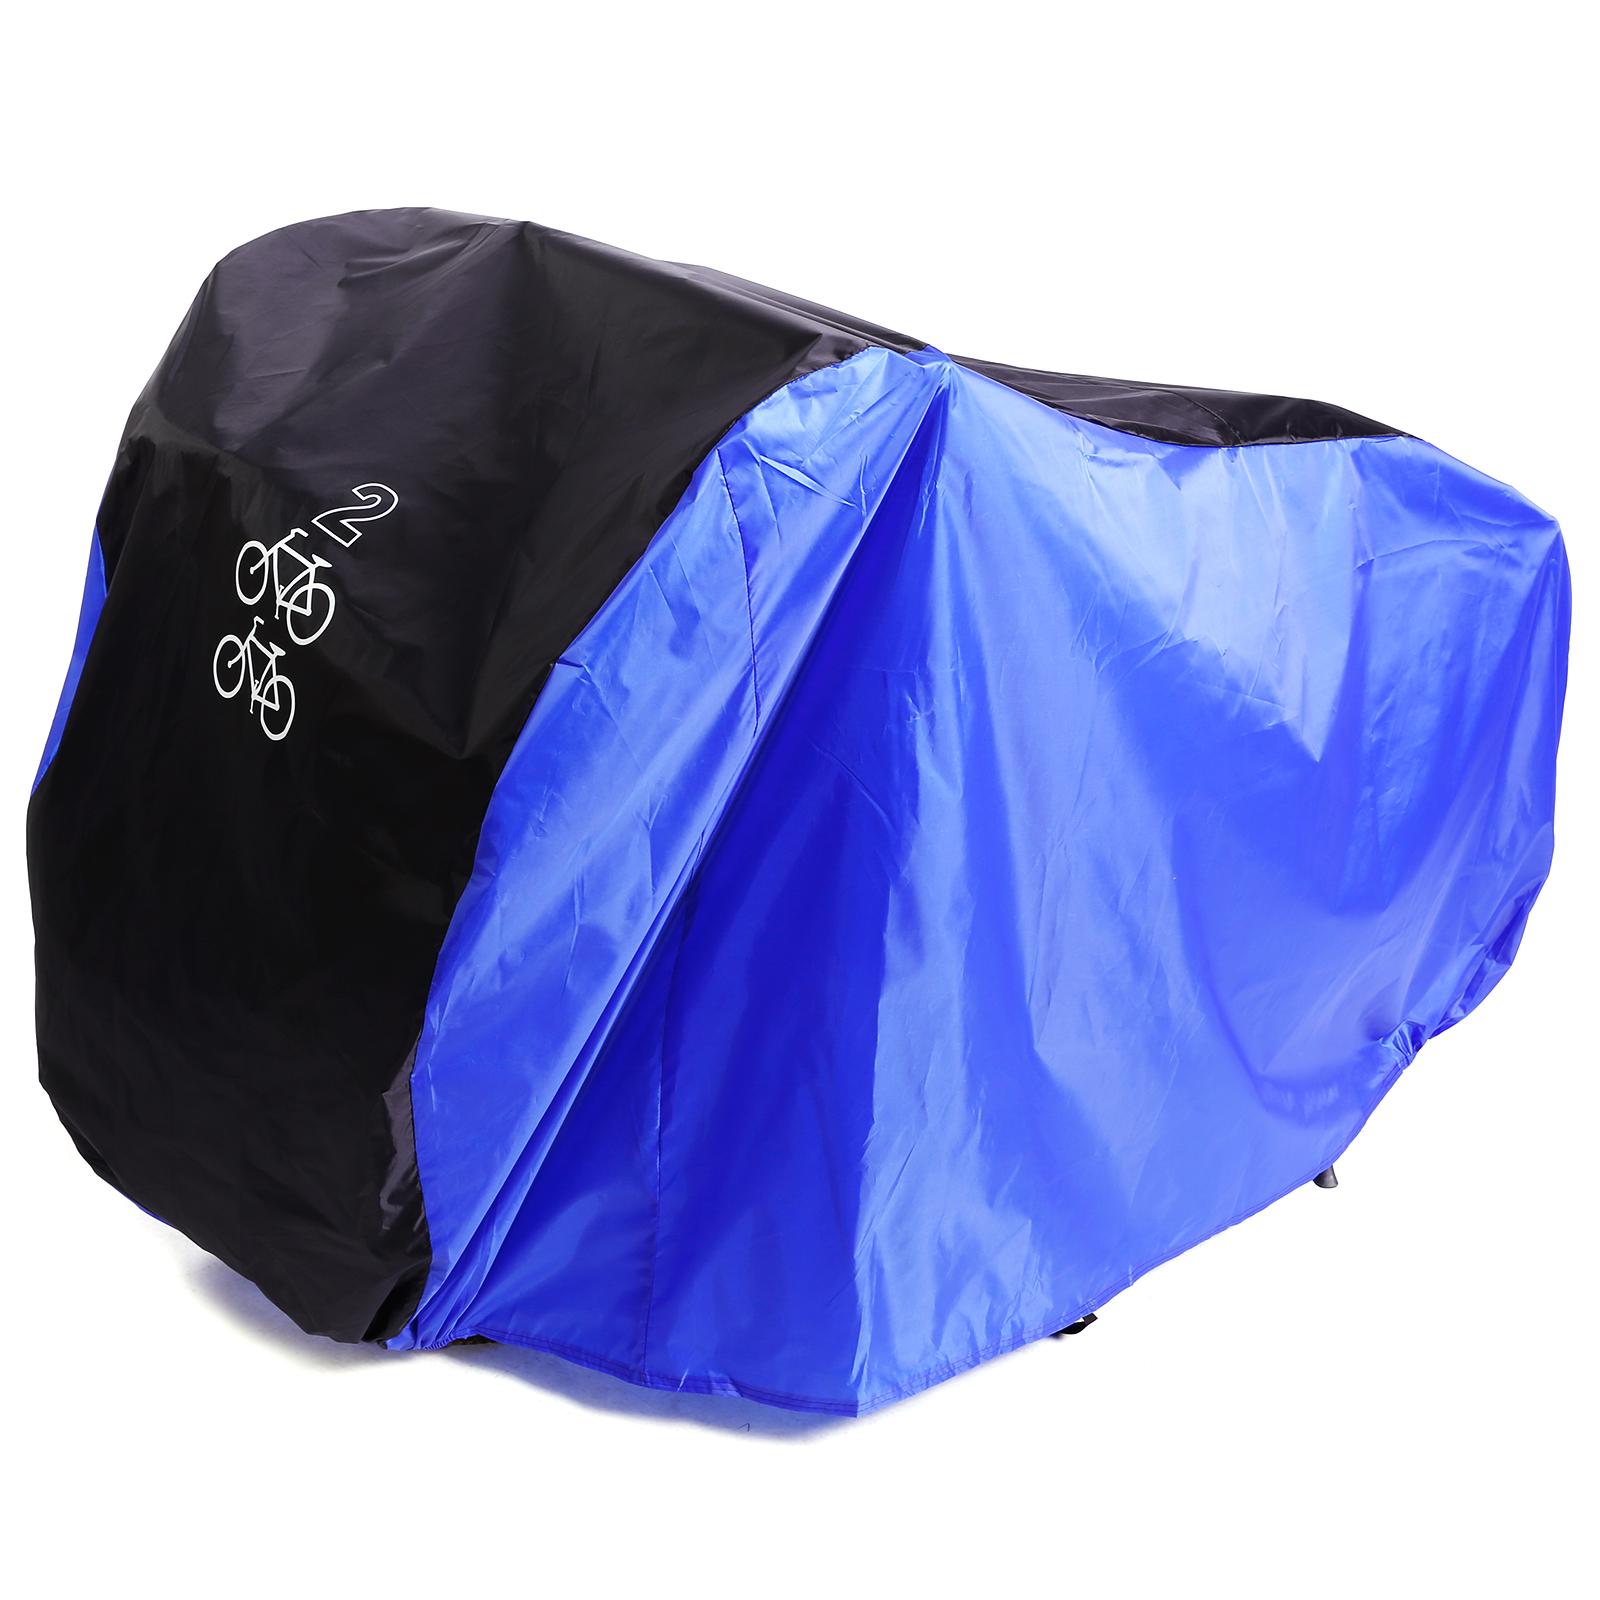 fahrrad h lle schutzabdeckung abdeck plane fahrradgarage f r bis 2 fahrr der ebay. Black Bedroom Furniture Sets. Home Design Ideas